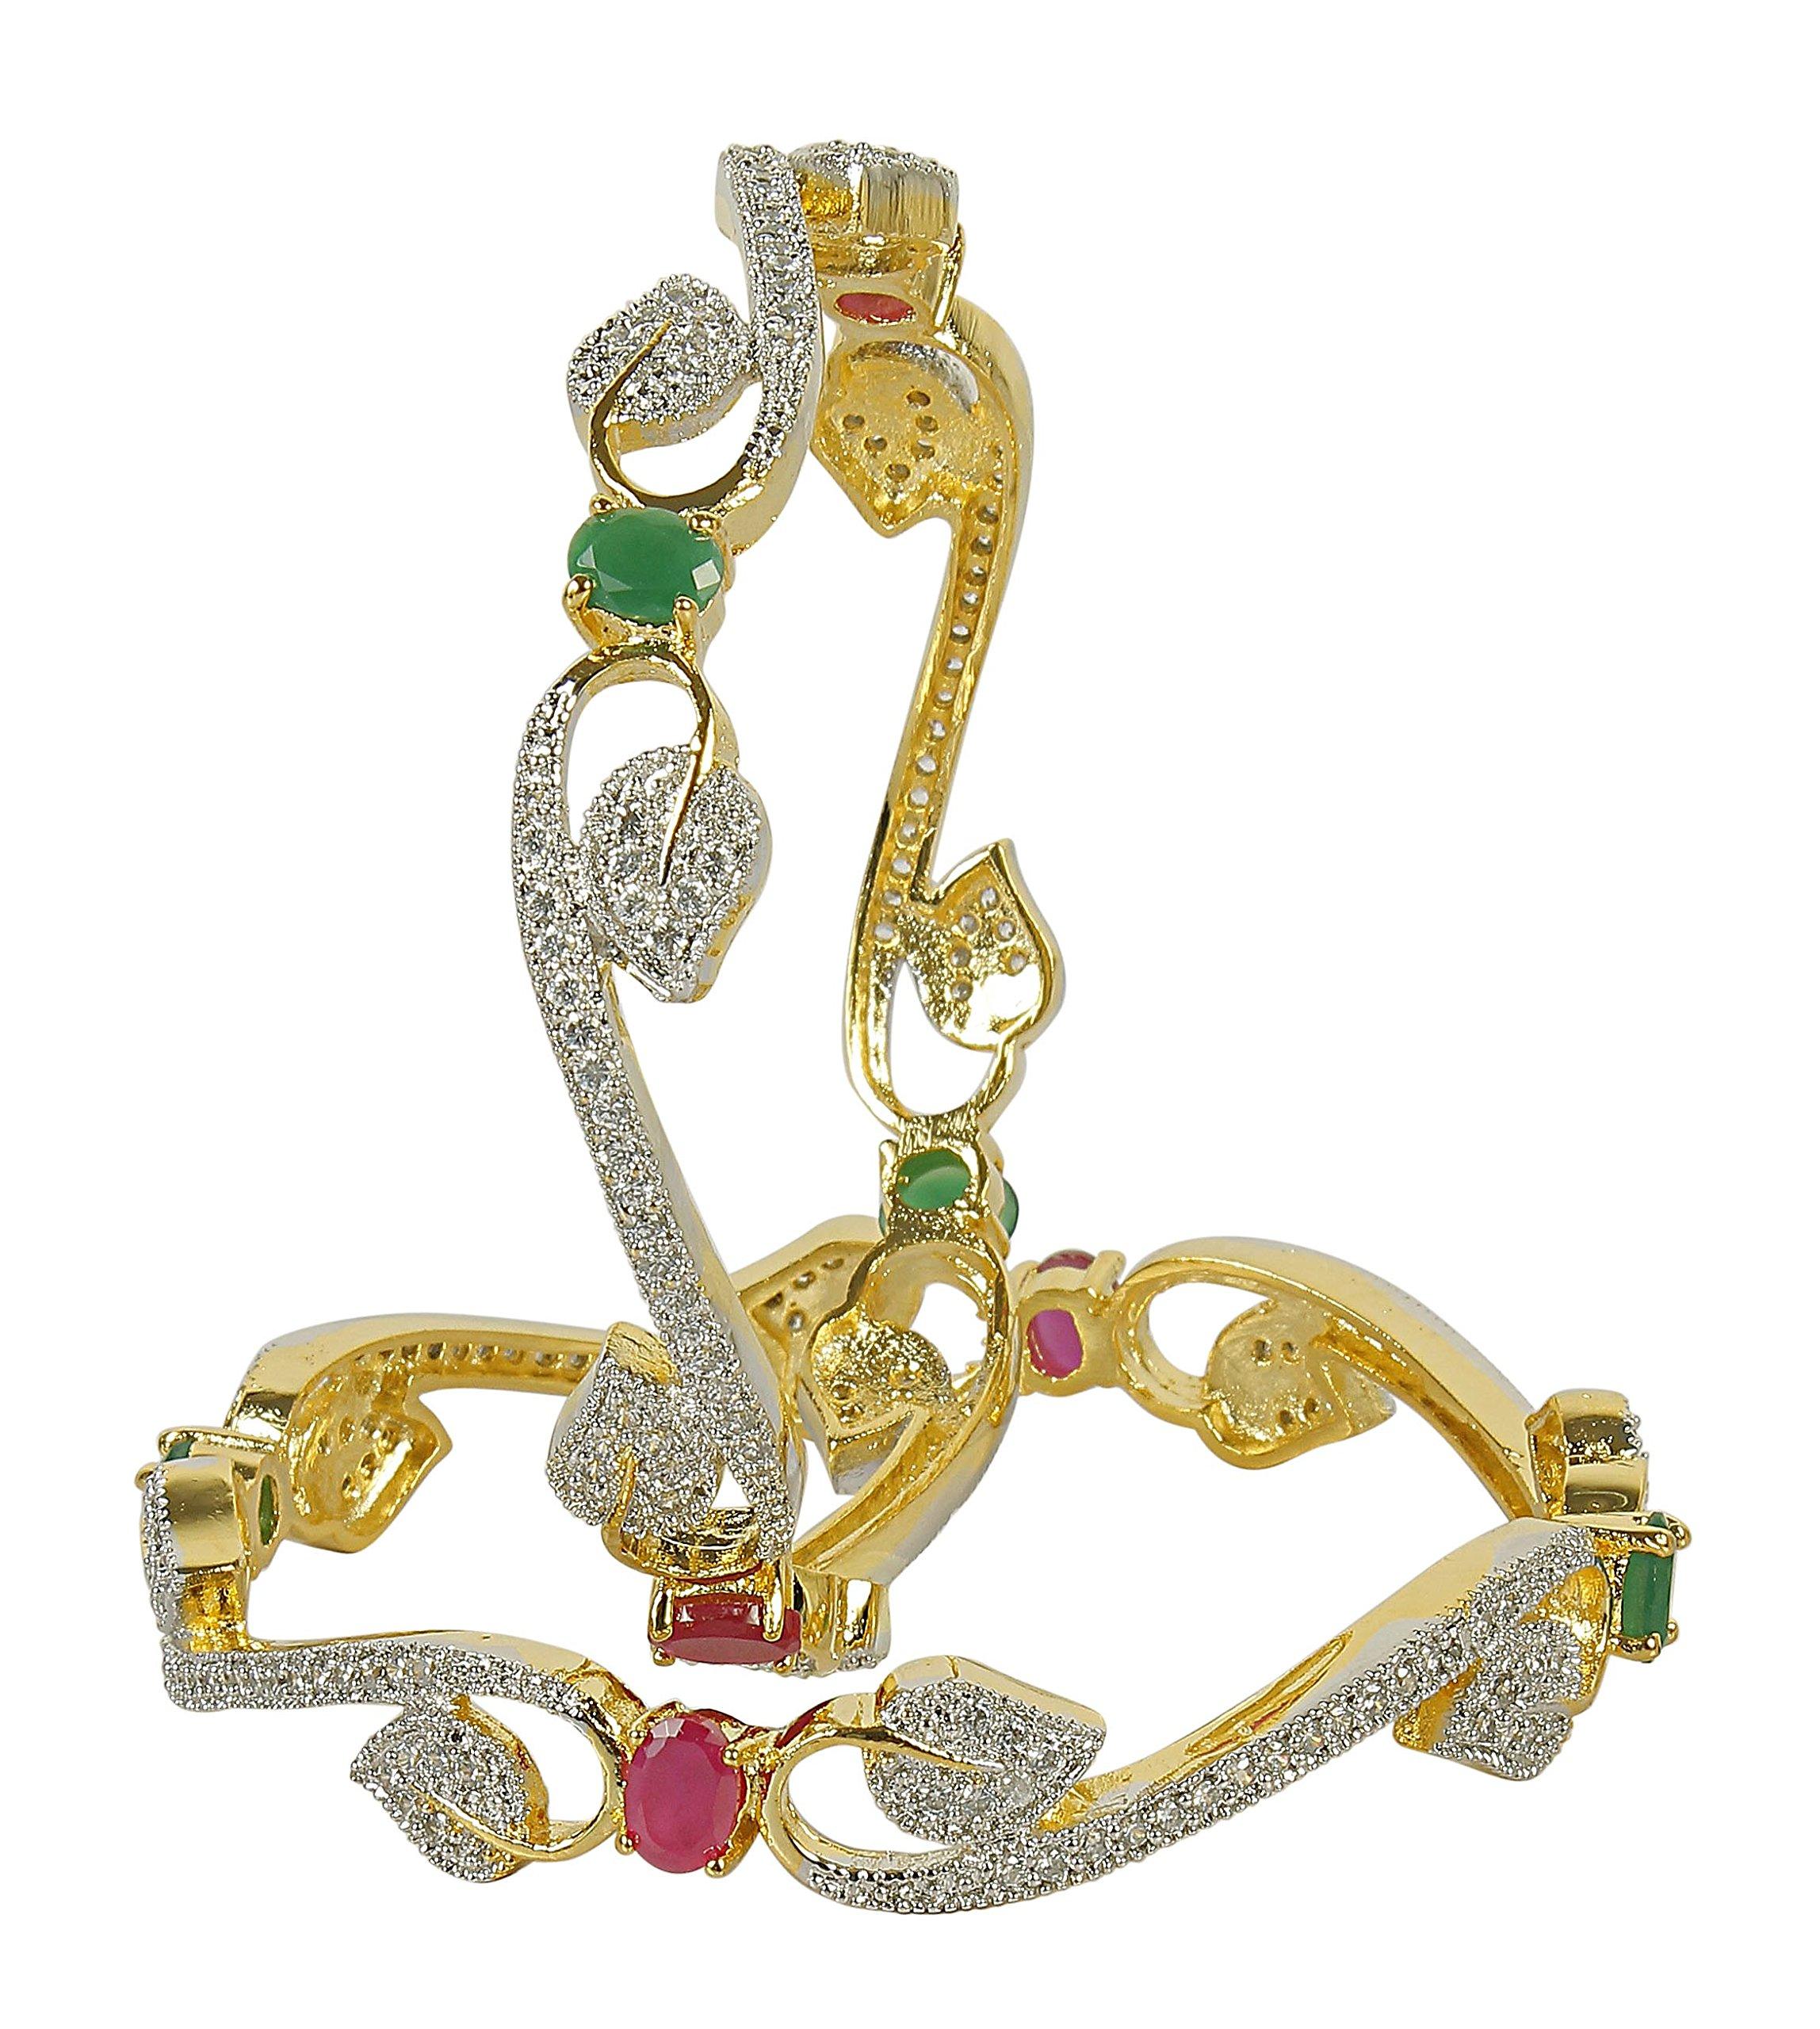 MUCHMORE Unique Style Gold Tone Diamond Swarovski Elements Indian Bangles Traditional Jewelry (2.4)